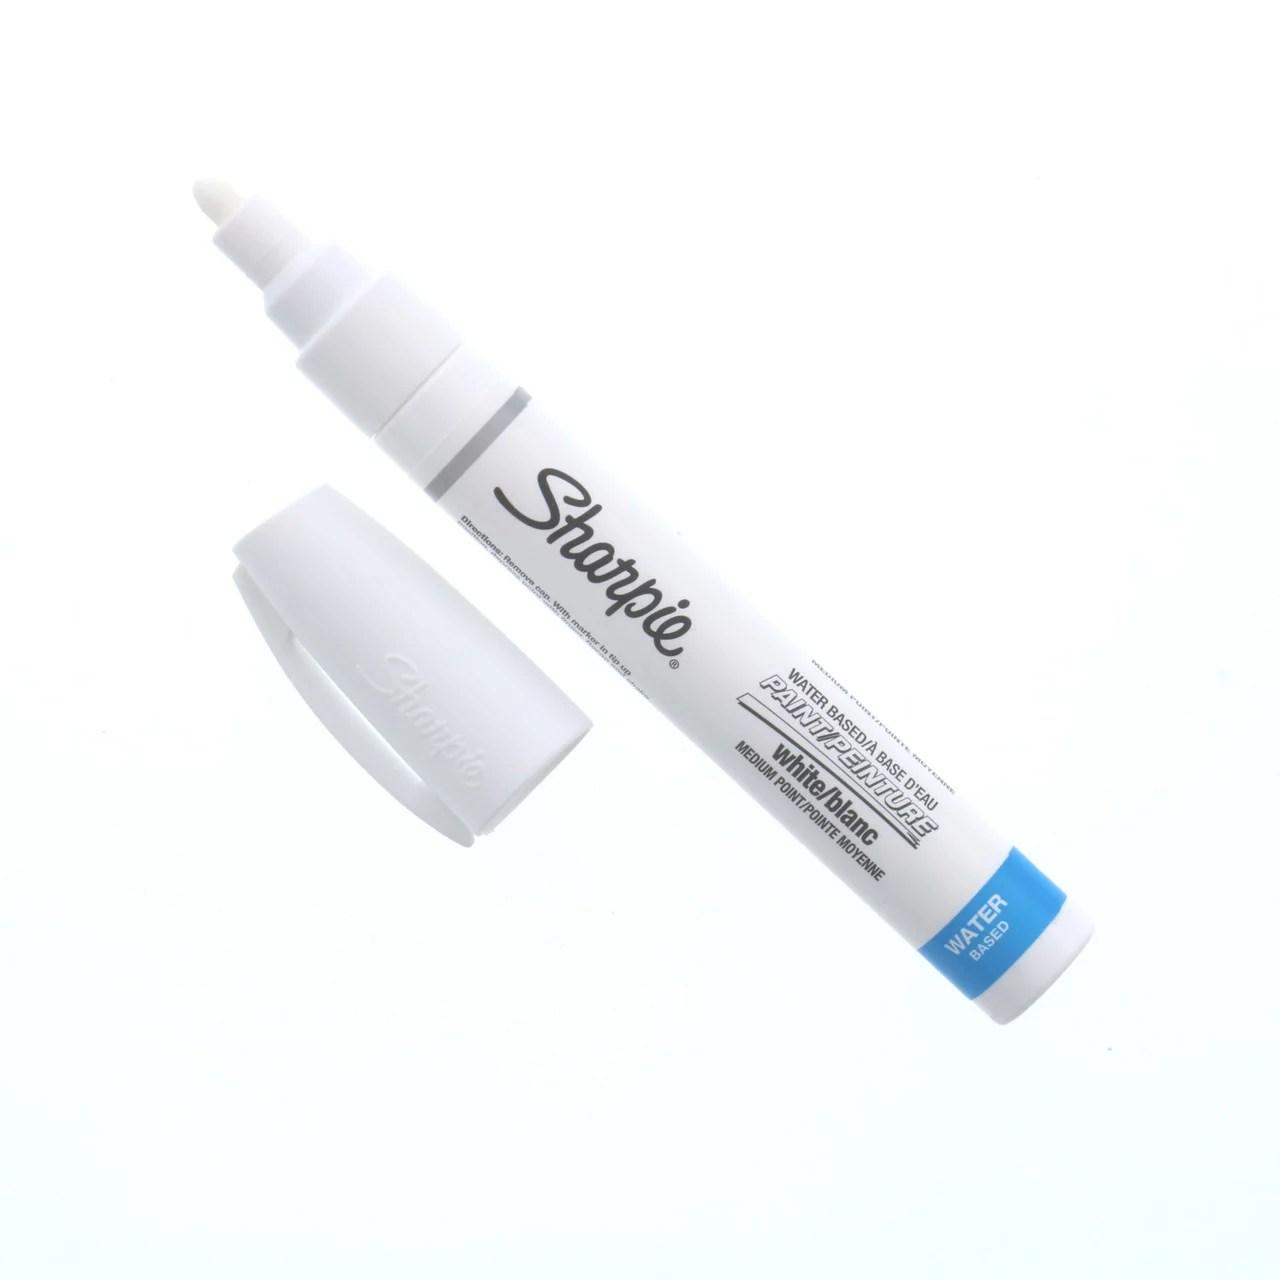 sharpie poster paint marker medium white walmart com